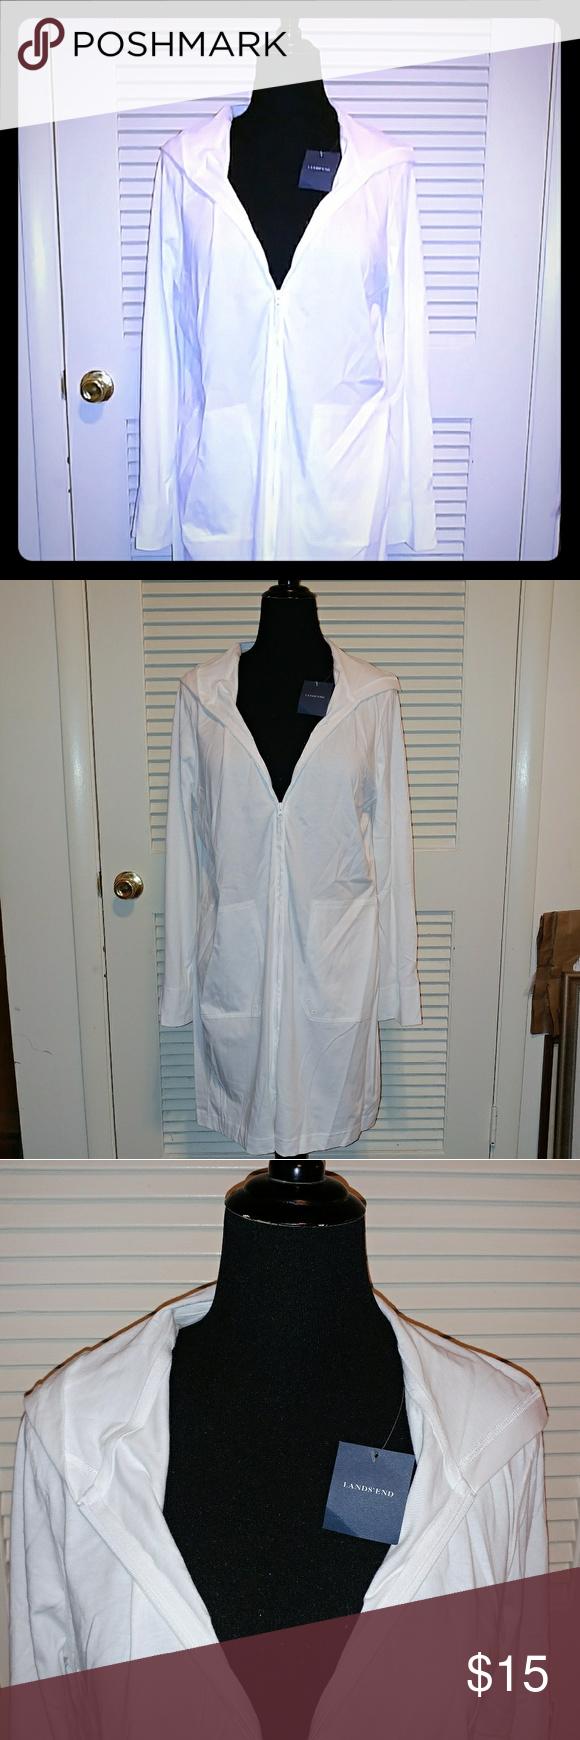 Bnwt Plus Size Lands End Zip Up Hoodie Clothes Design Fashion Design Fashion Tips [ 1740 x 580 Pixel ]